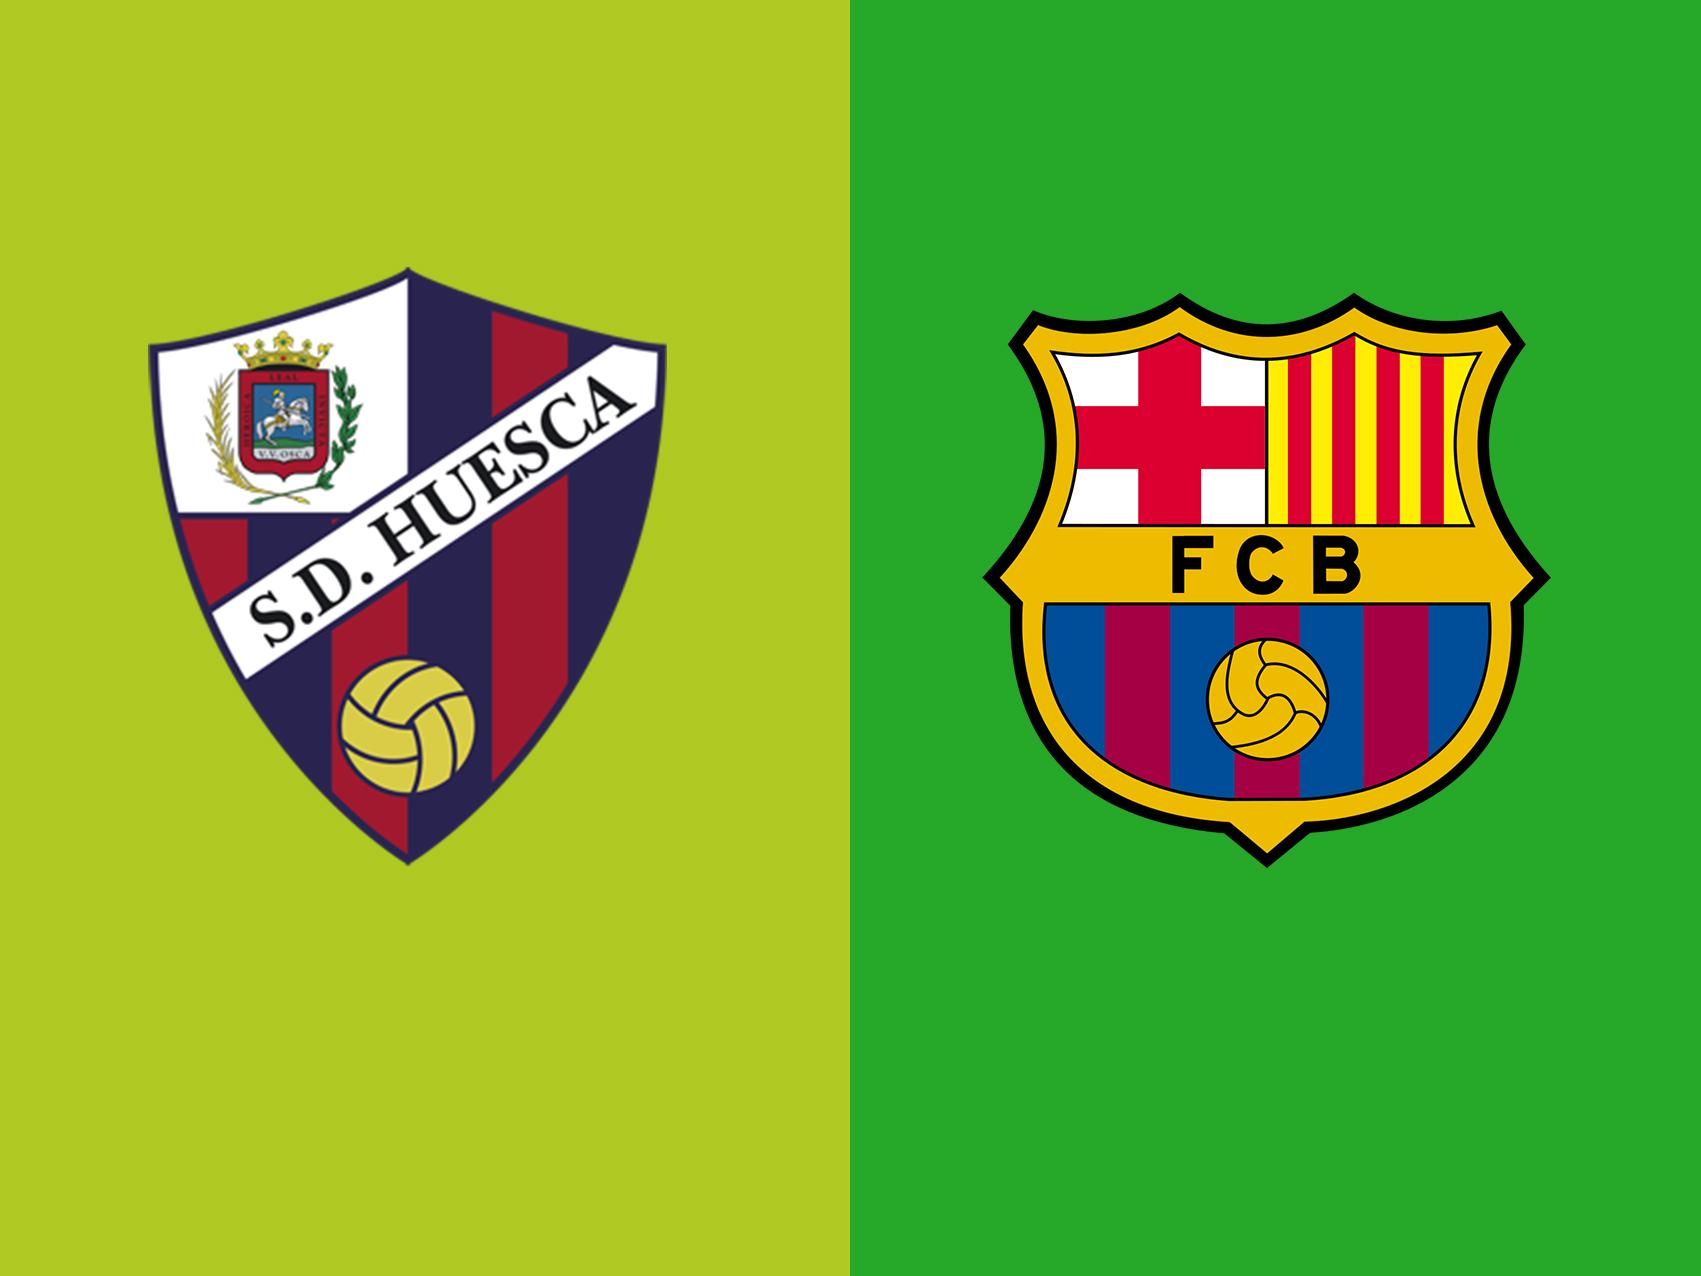 soi-keo-ca-cuoc-bong-da-ngay-13-4-slavia-praha-vs-Barcelona-cong-pha-phao-dai-b9 1